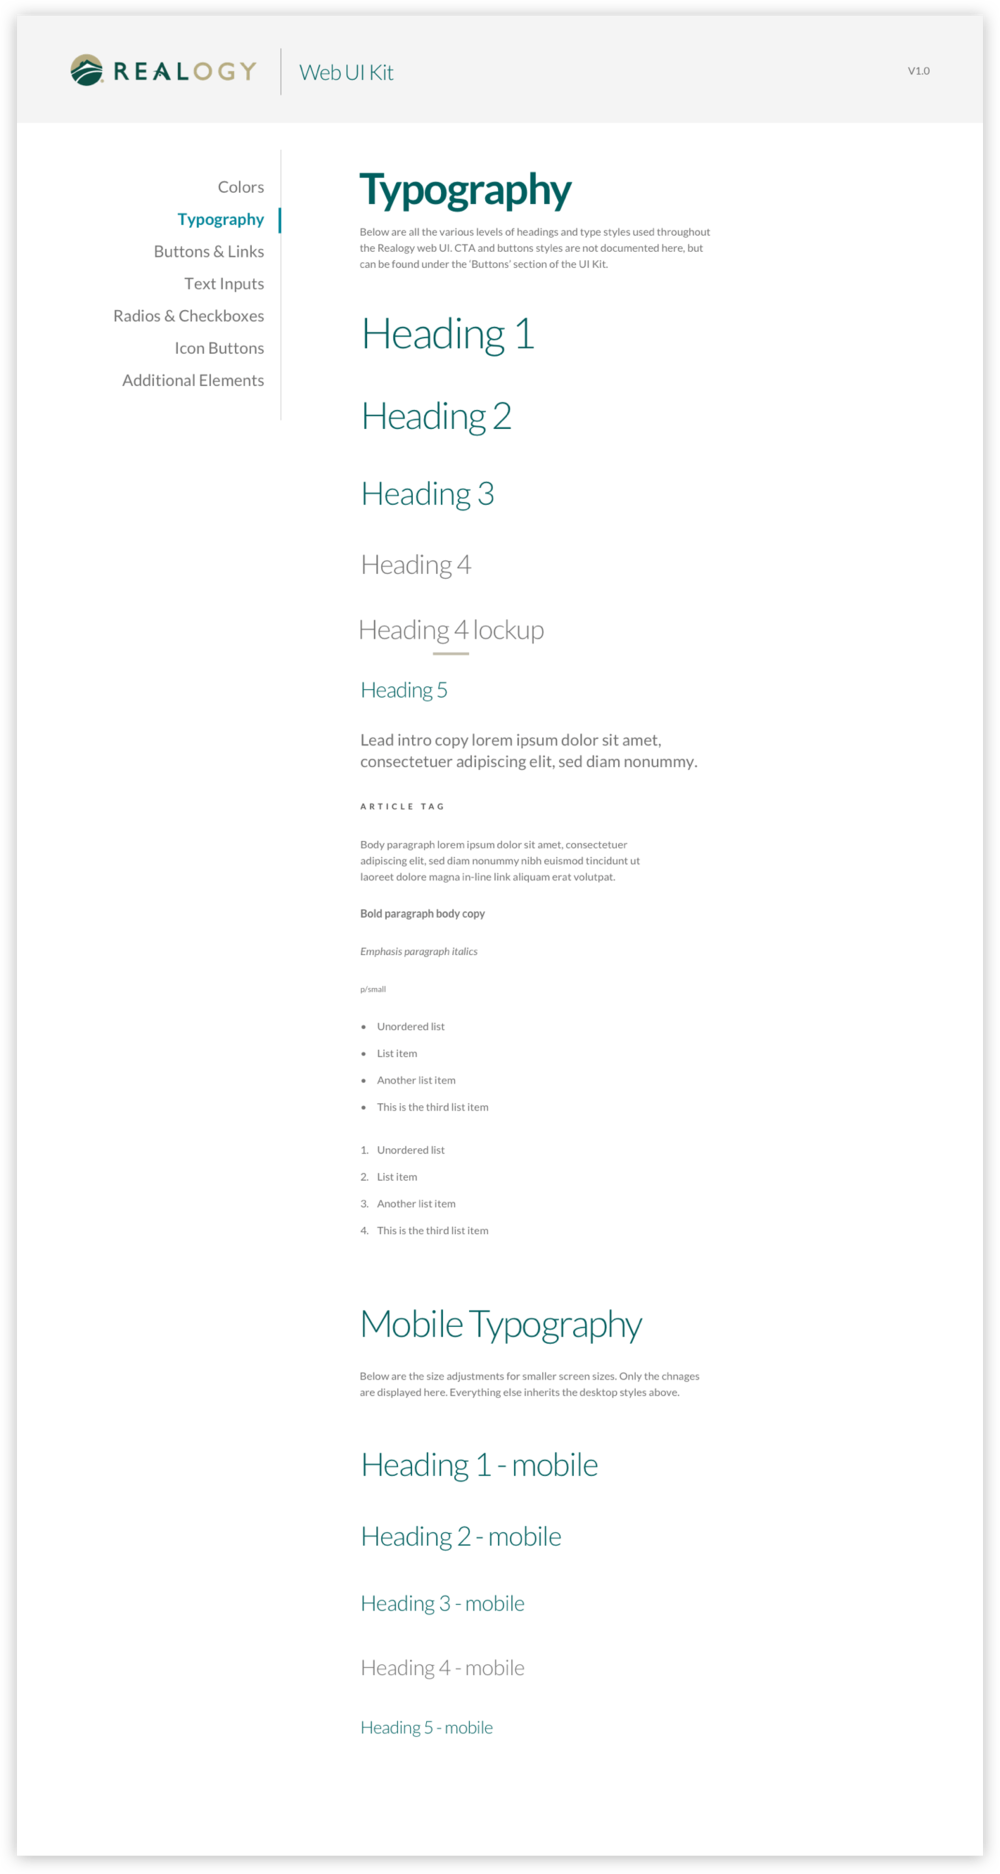 Realogy_UI_Type.png